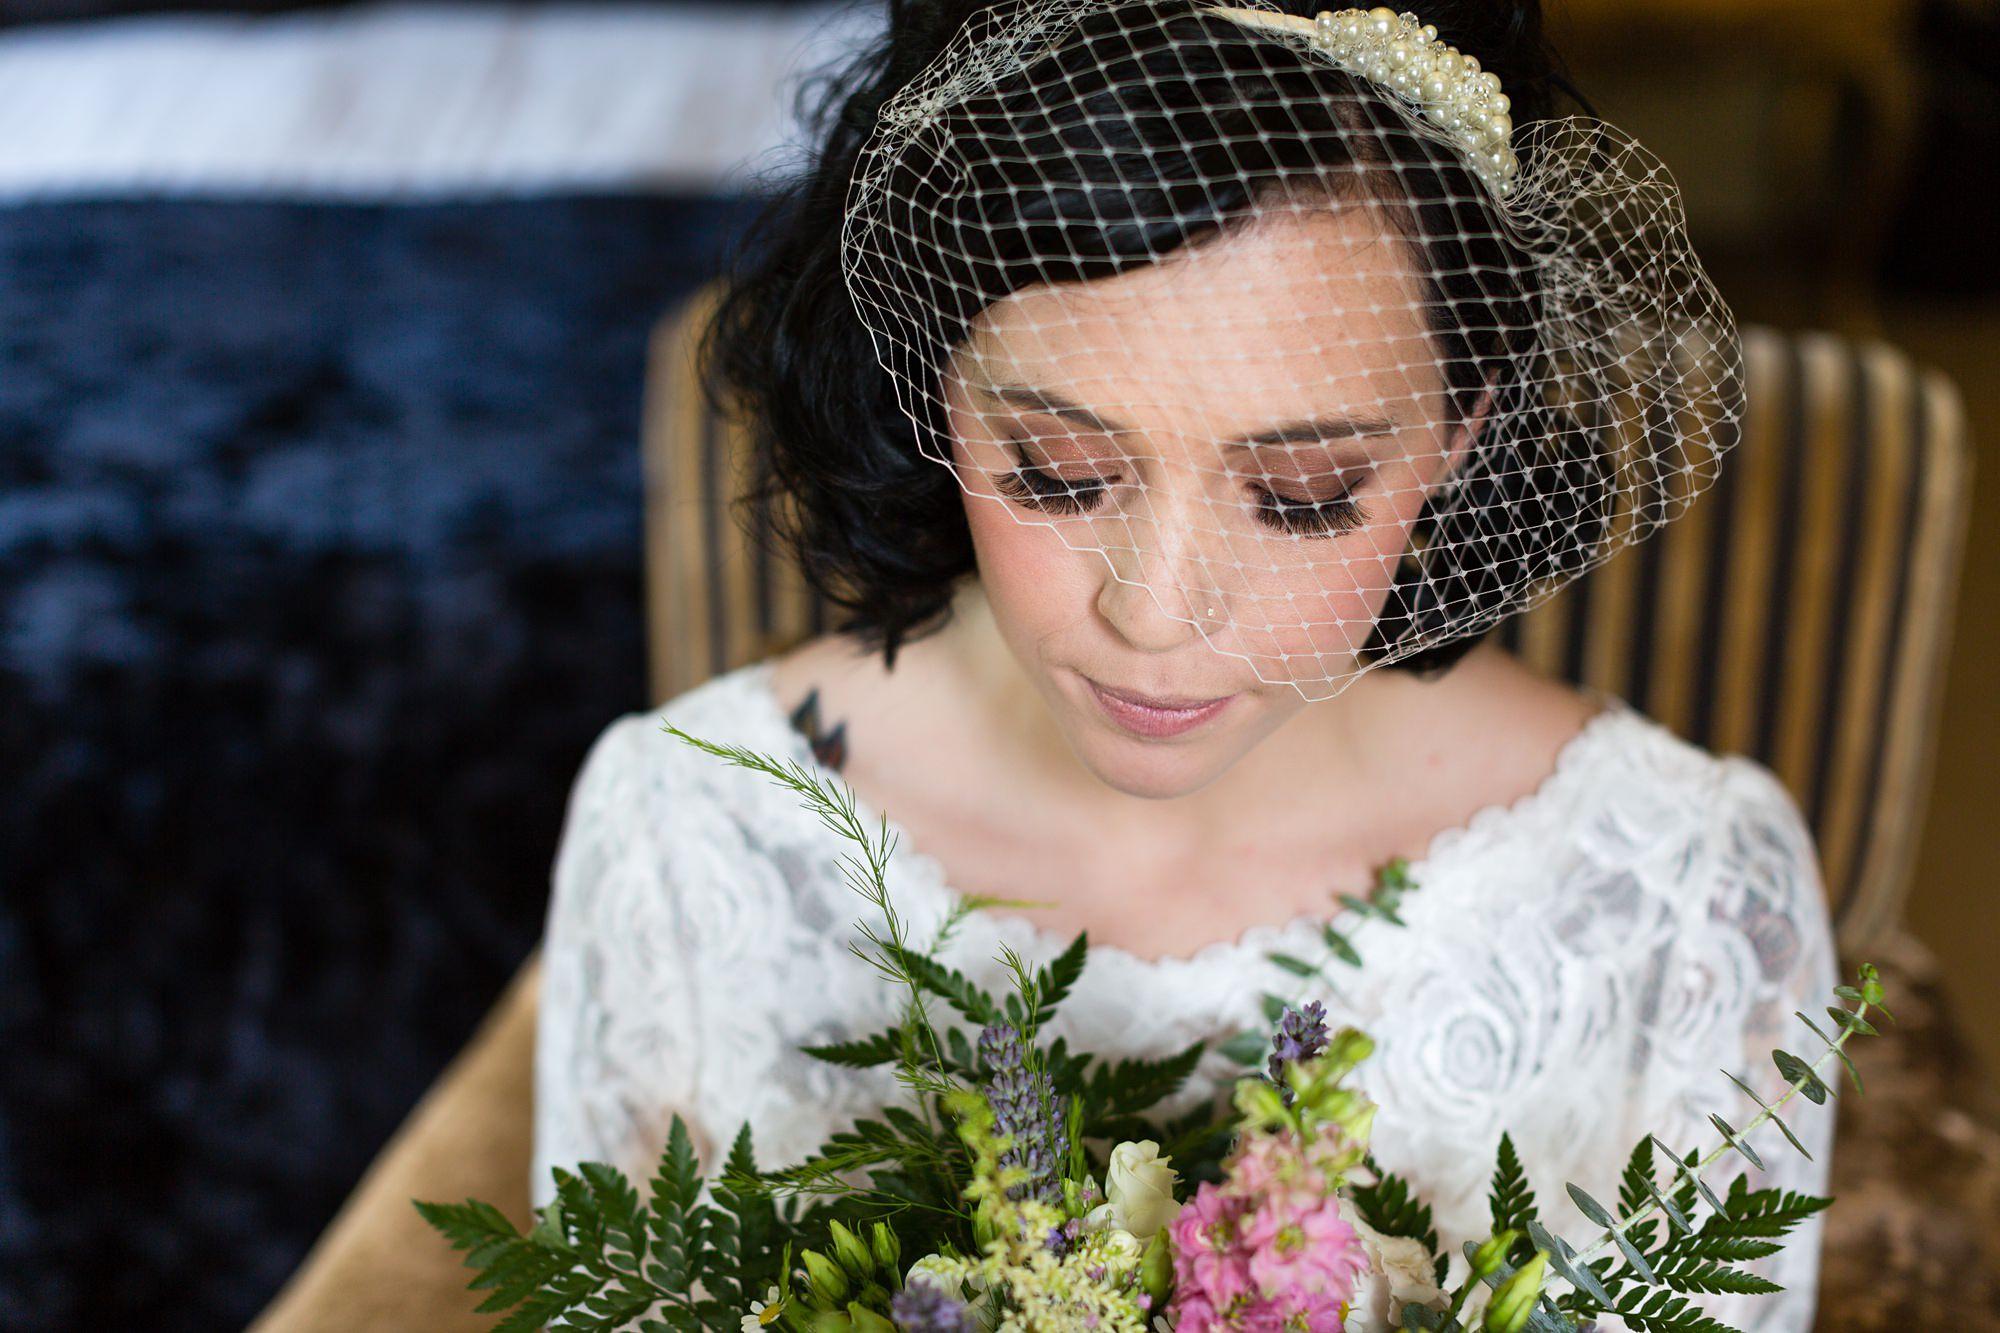 Bride looks down at bouquet